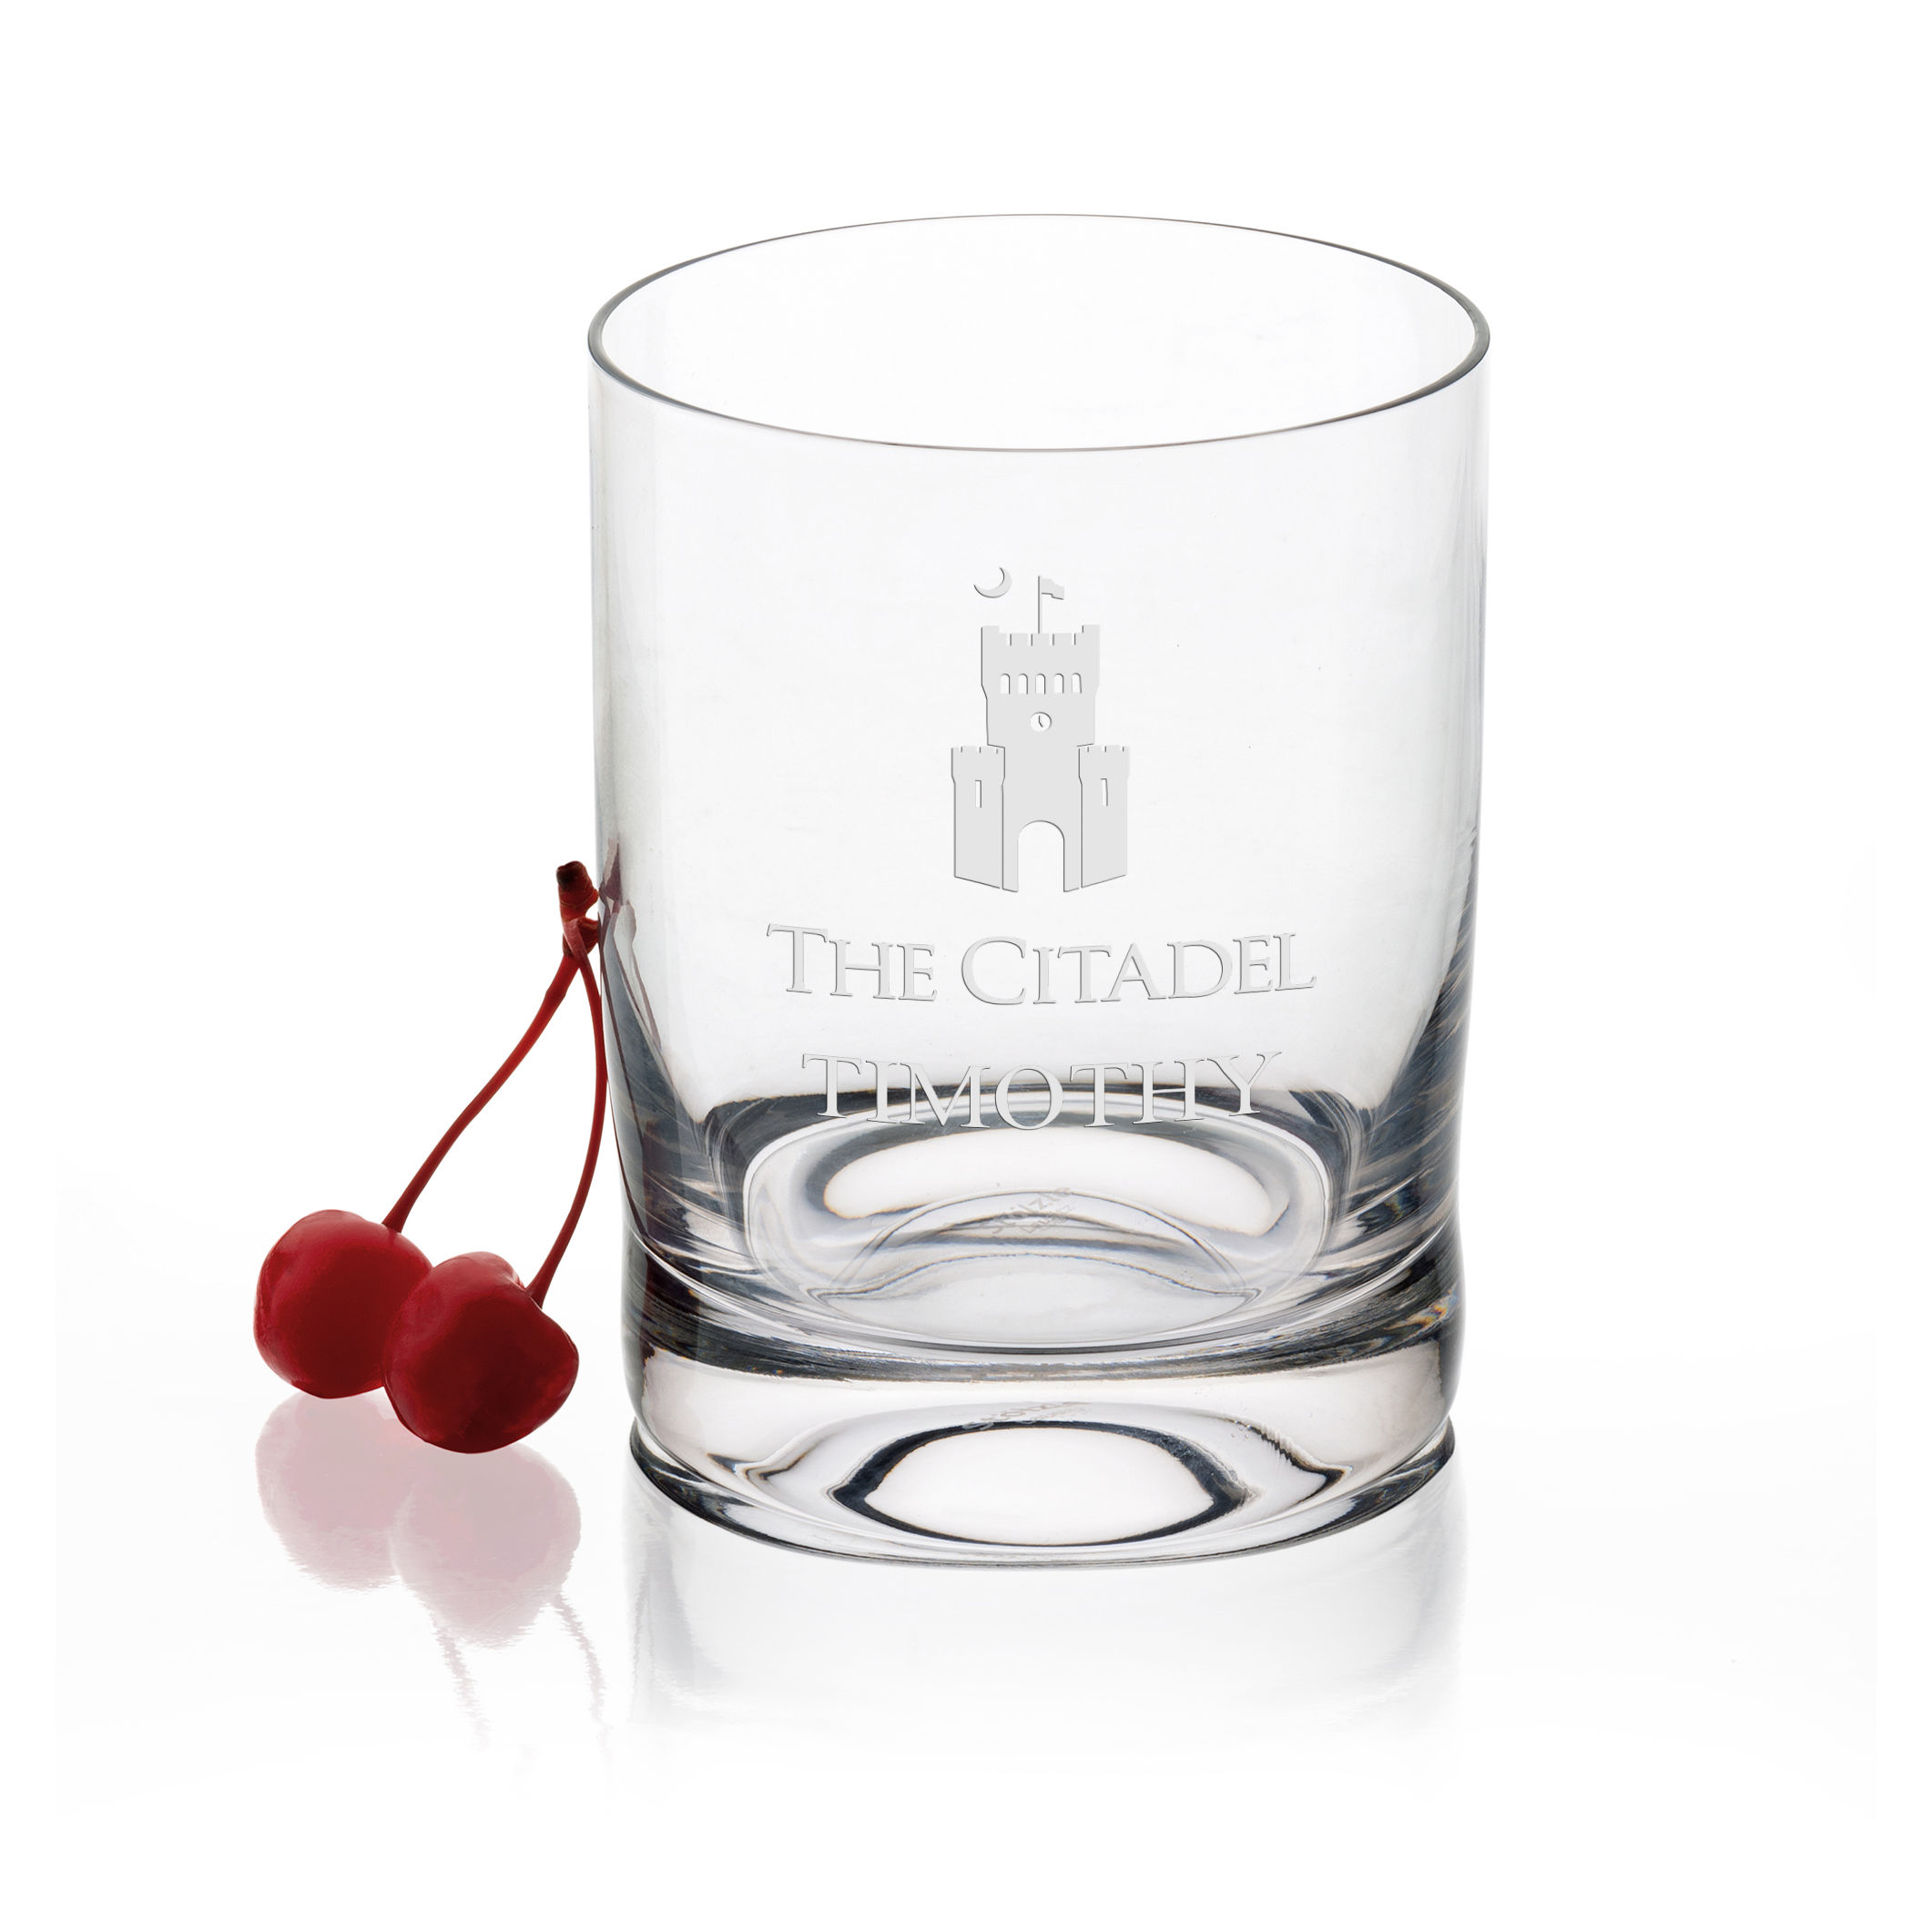 Citadel Tumbler Glasses - Set of 4